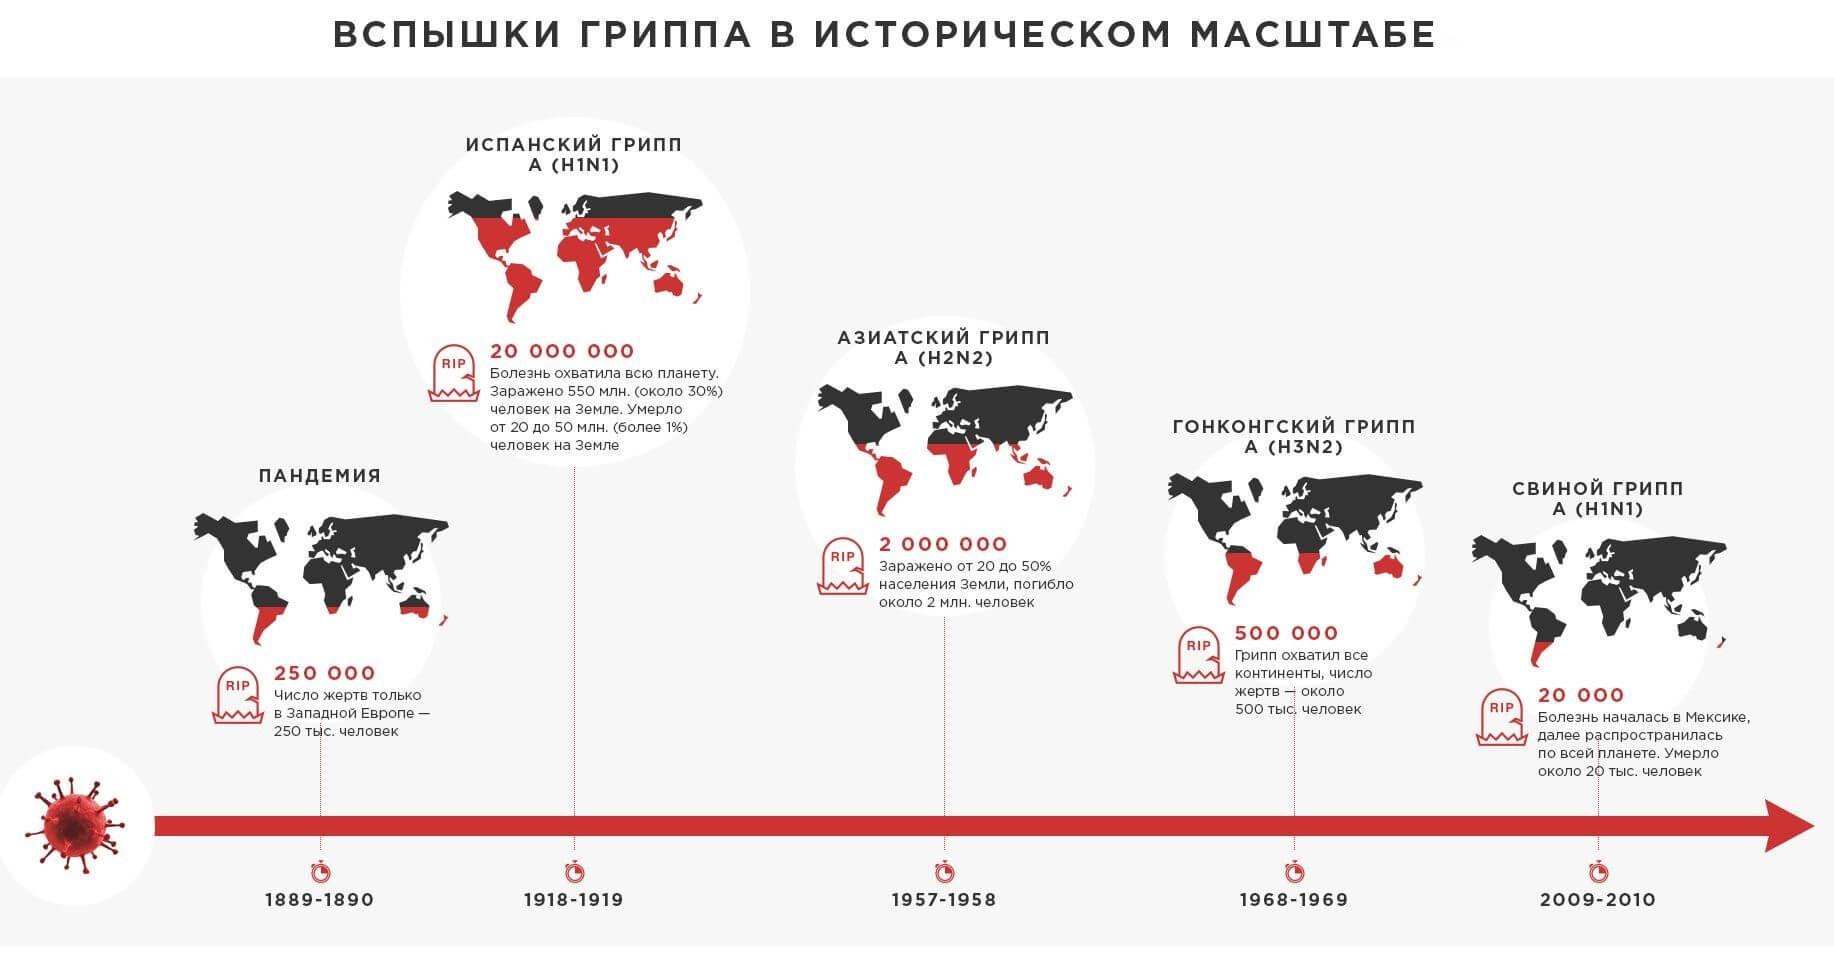 Карта эпидемий гриппа